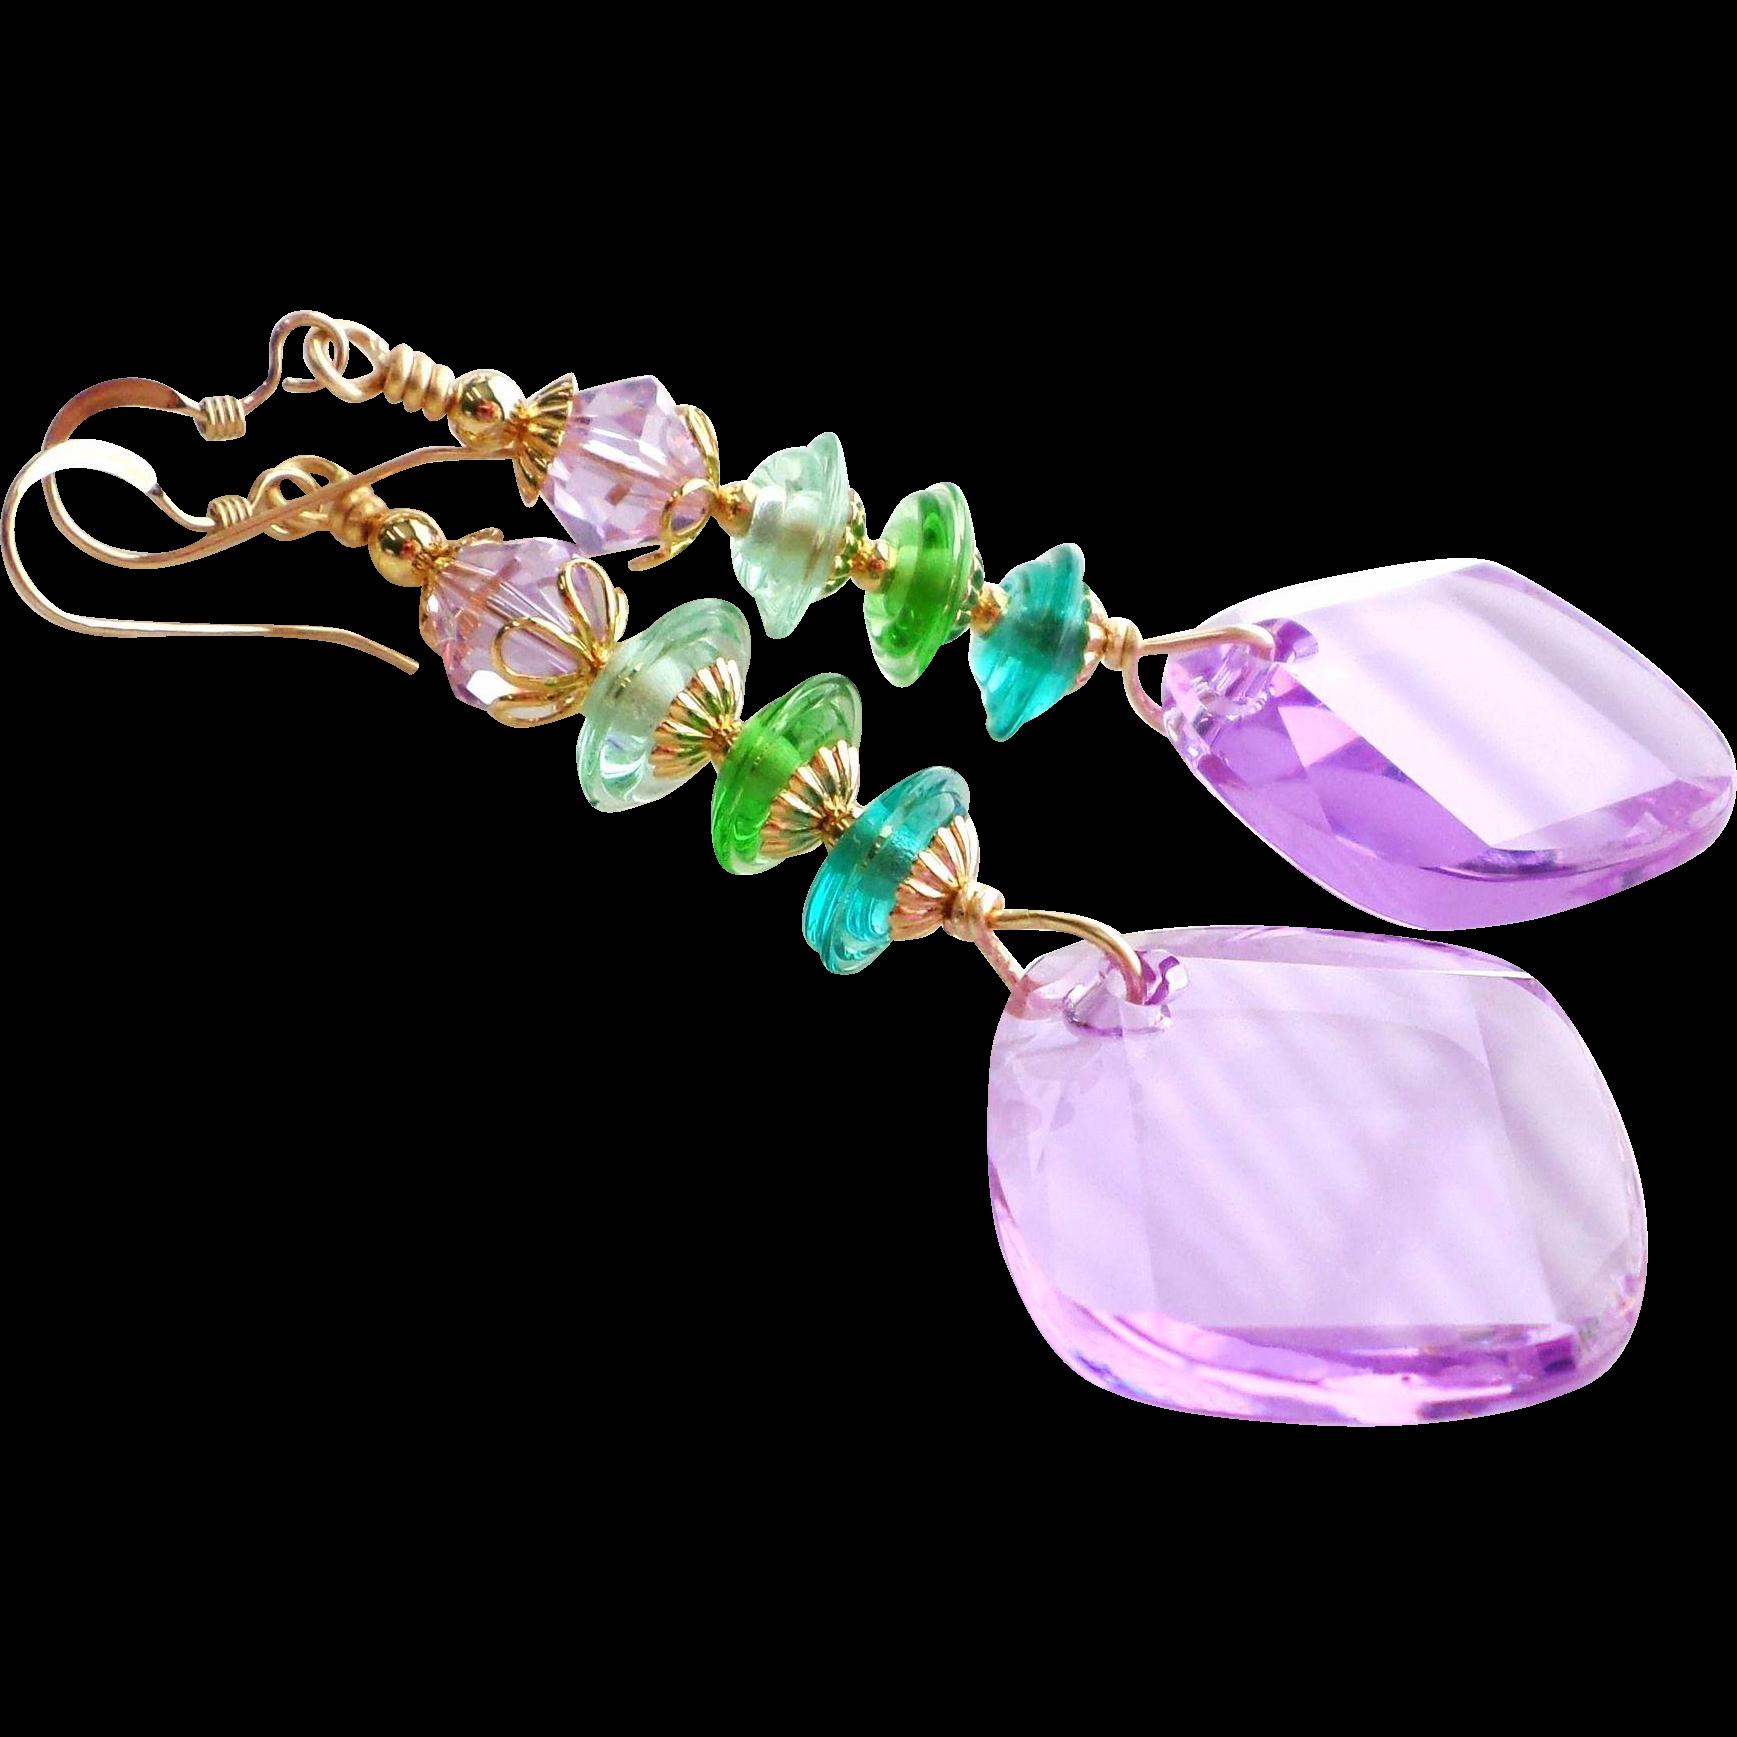 Swarovski Crystal and Lampwork Glass Colorful Long Earrings